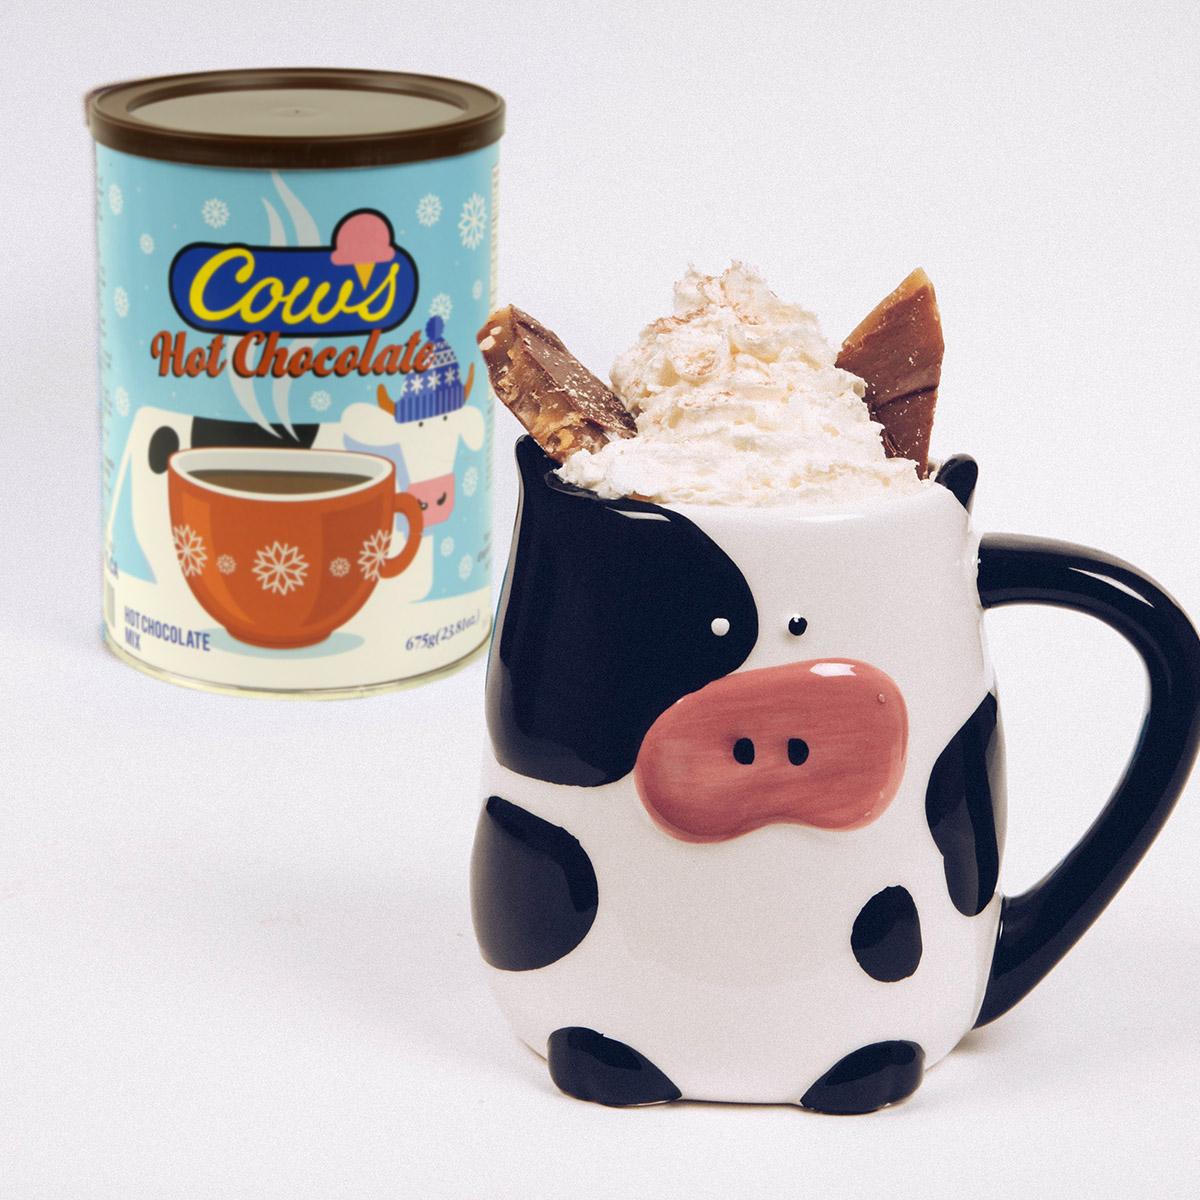 COWS Hot Chocolate and Filled Mug